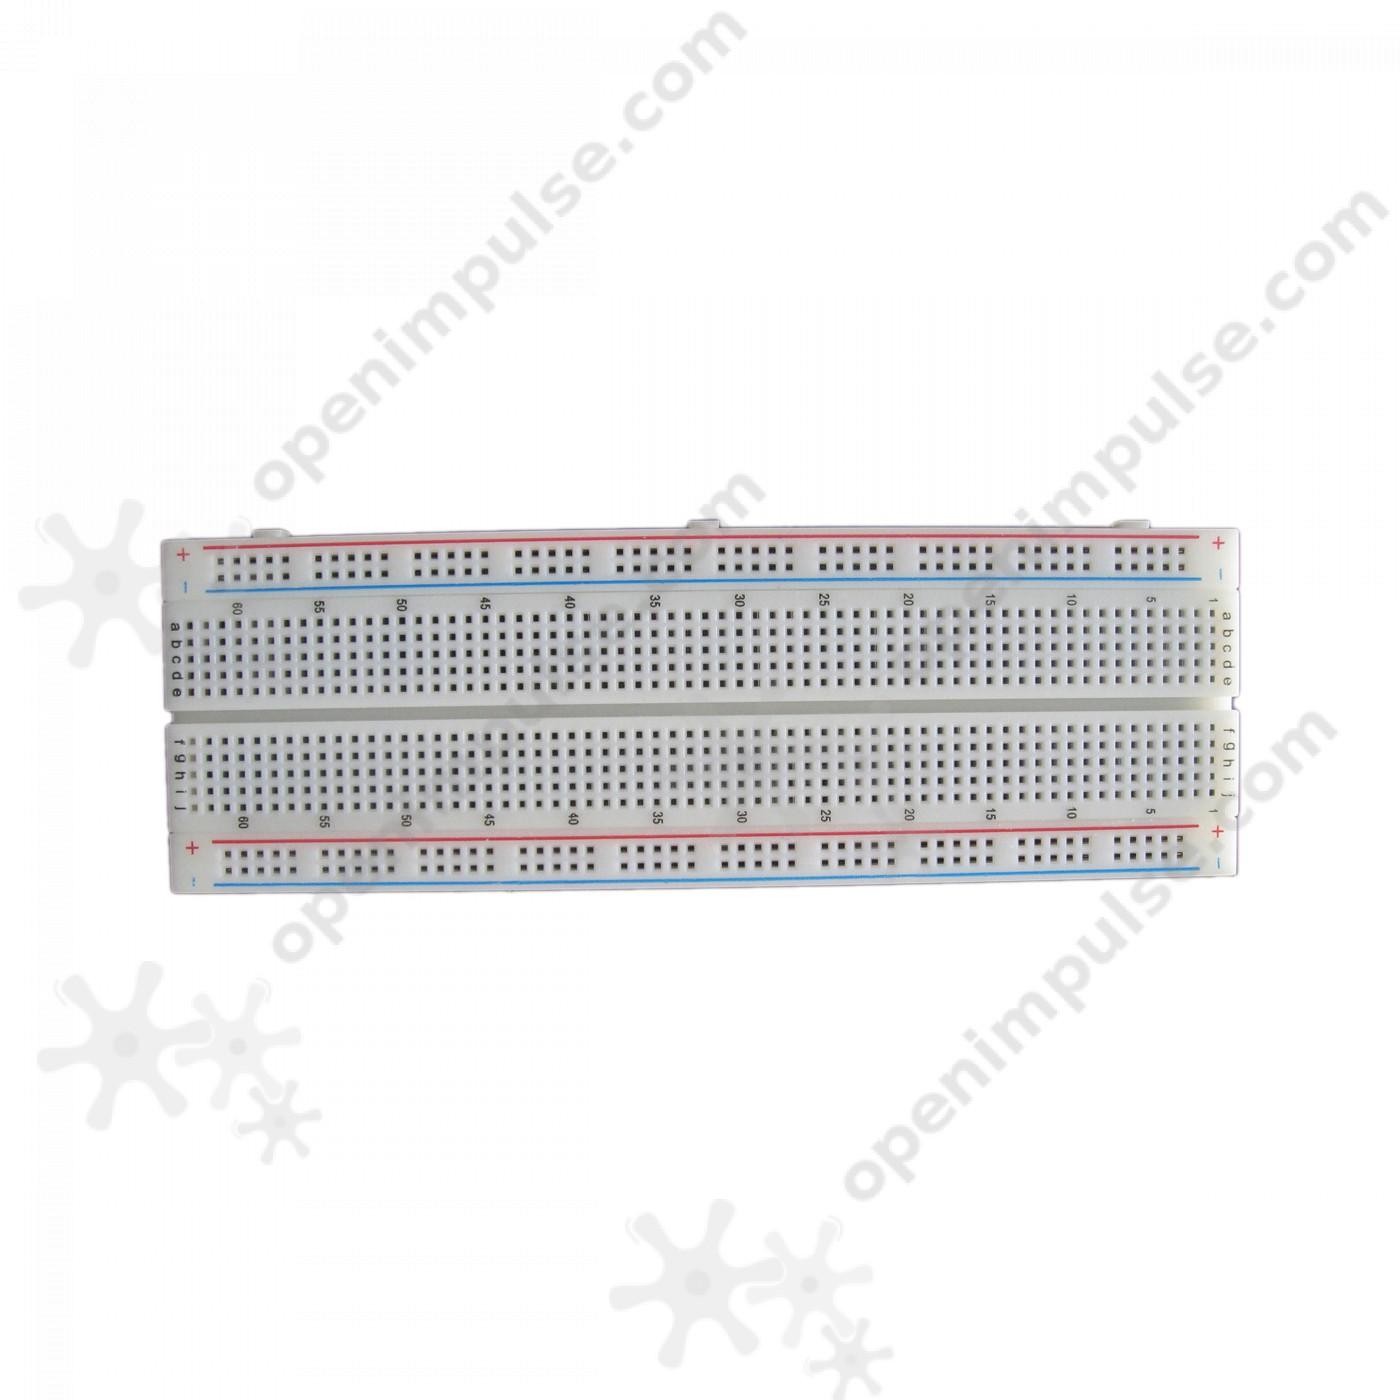 830 Holes Breadboard (17.5 x 5 cm)